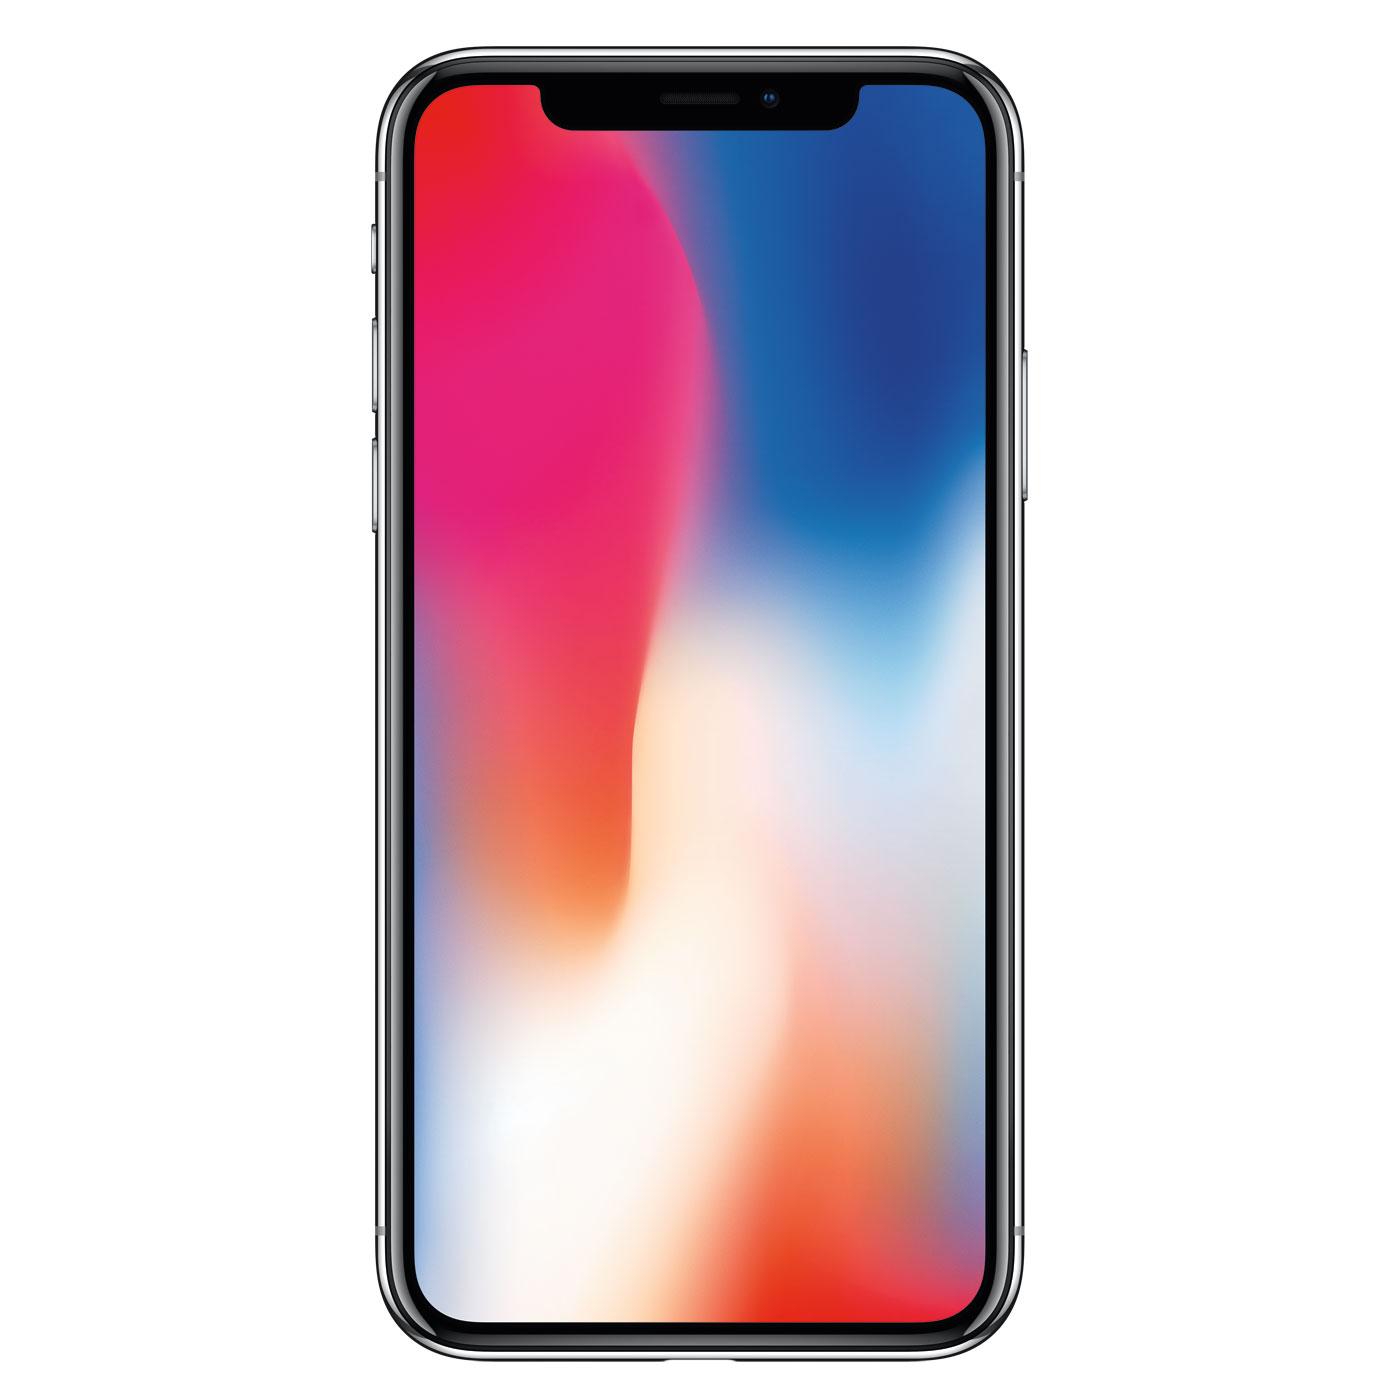 Apple iPhone X 256Go Argent - Téléphonie Apple - Cybertek.fr - 3